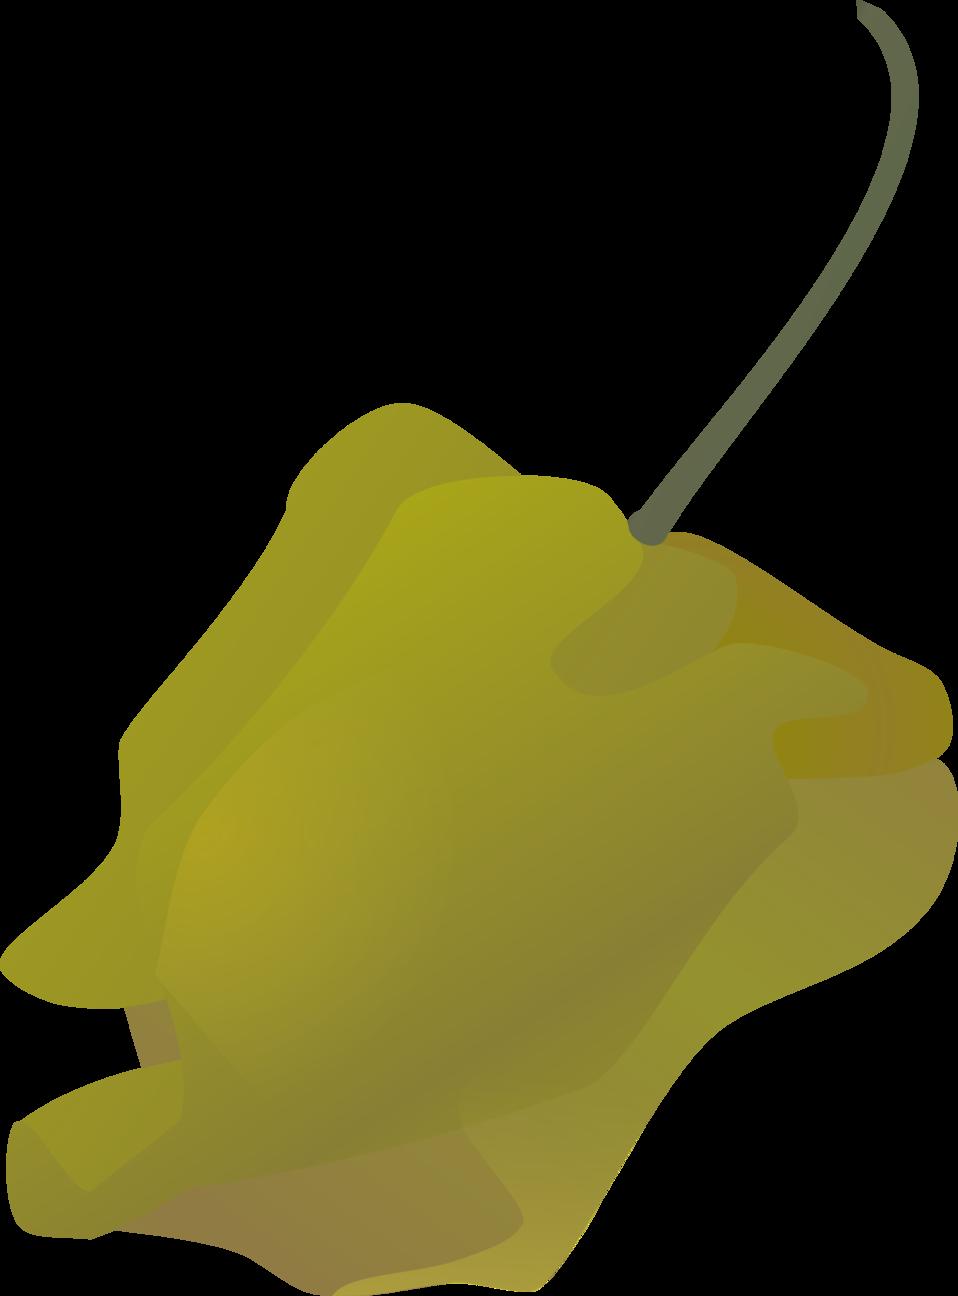 habanero pepper simple